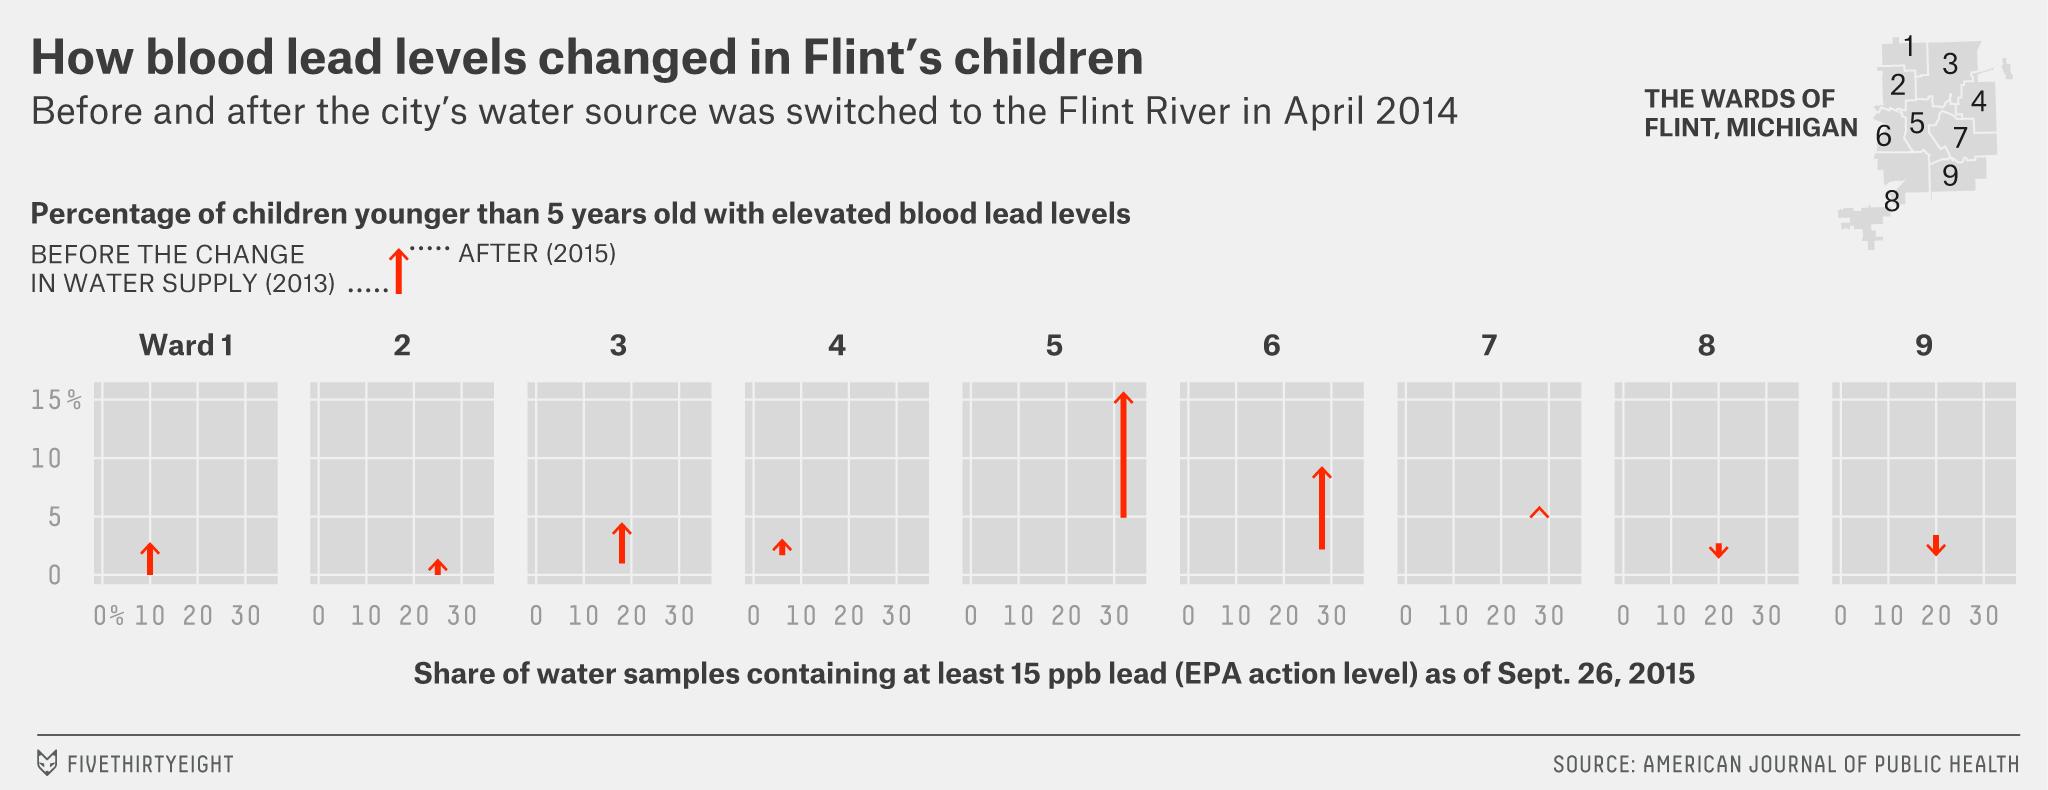 ambj-flint-lead-chart-3